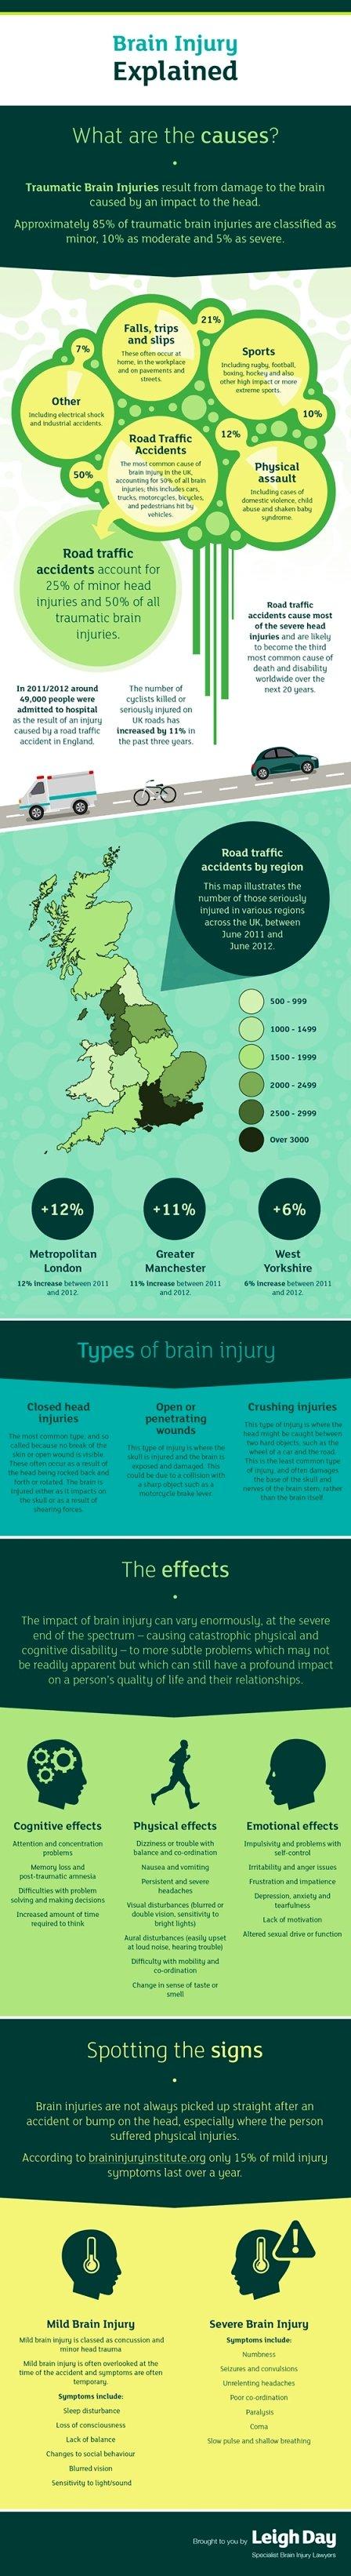 Brain Injury Explained #Infographic